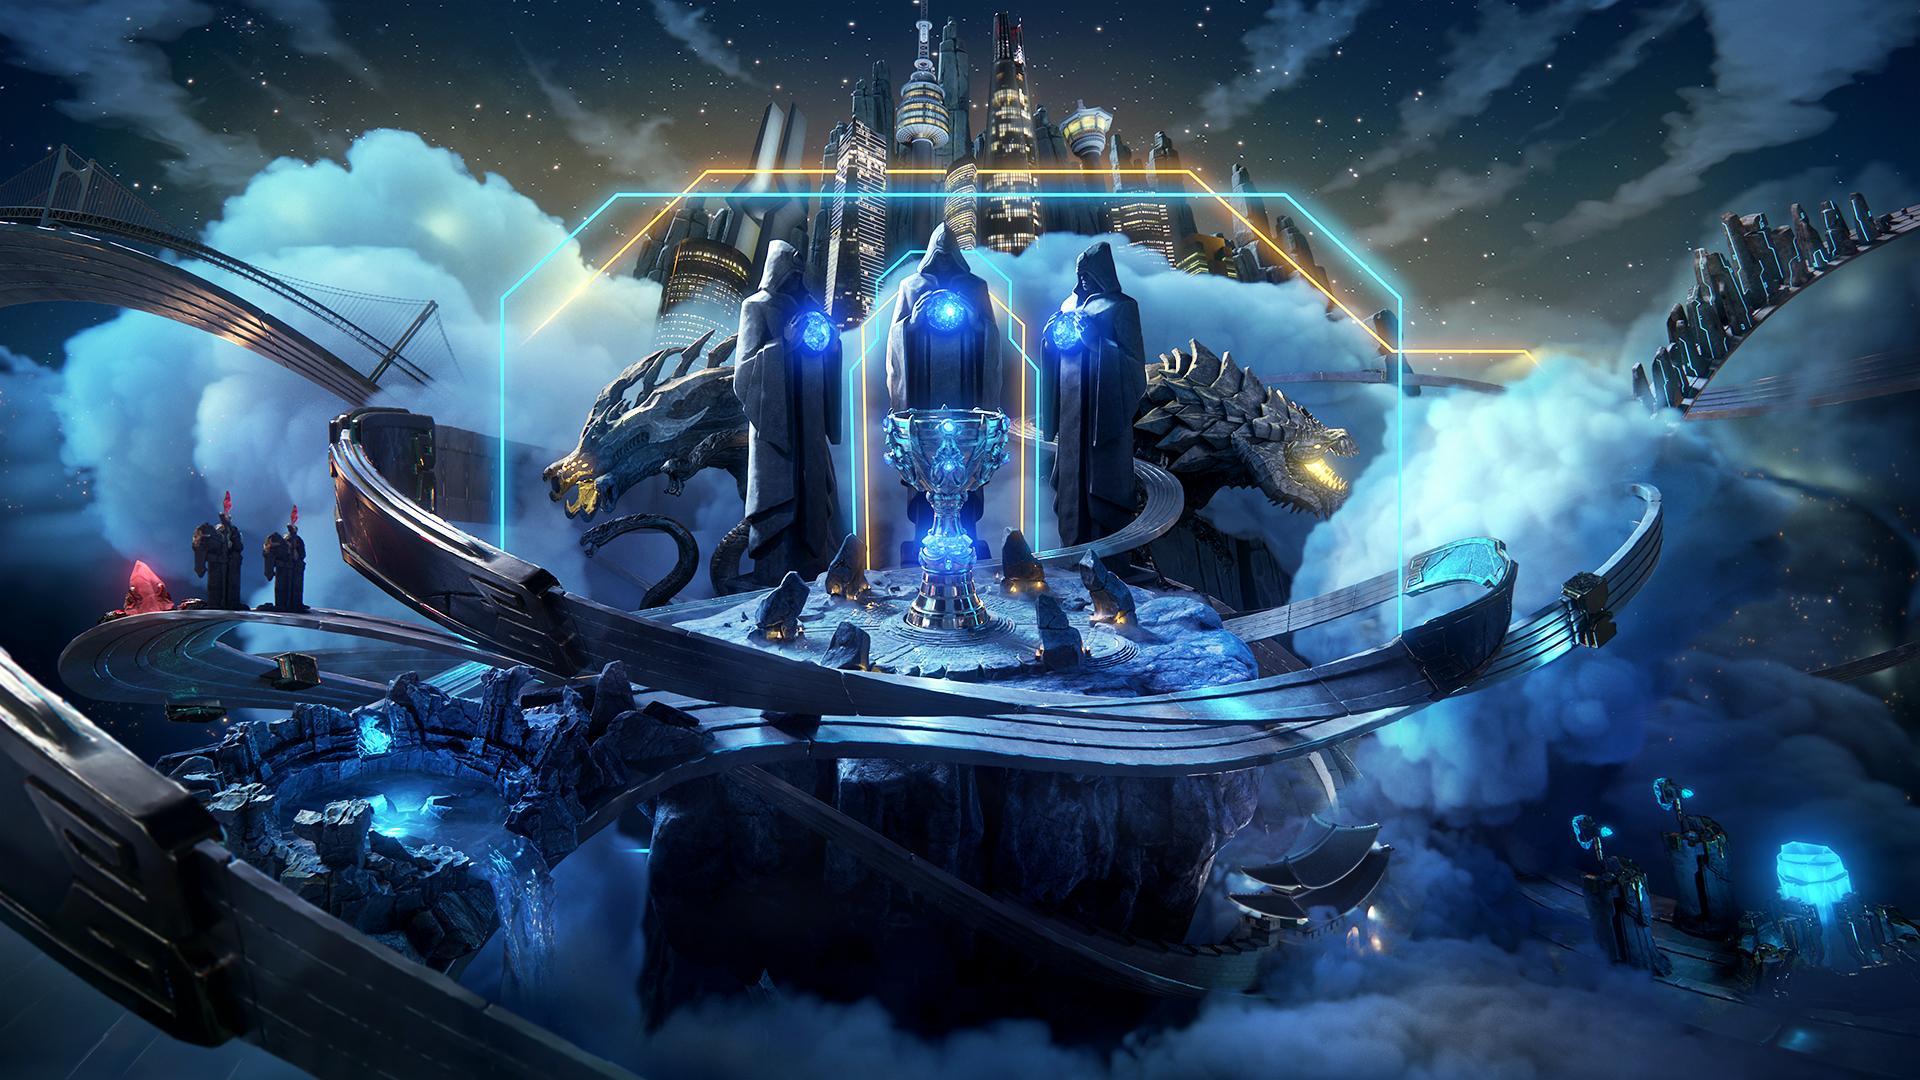 Con presencia argentina, Kaos Latin Gamers debuta en el Mundial de League of Legends